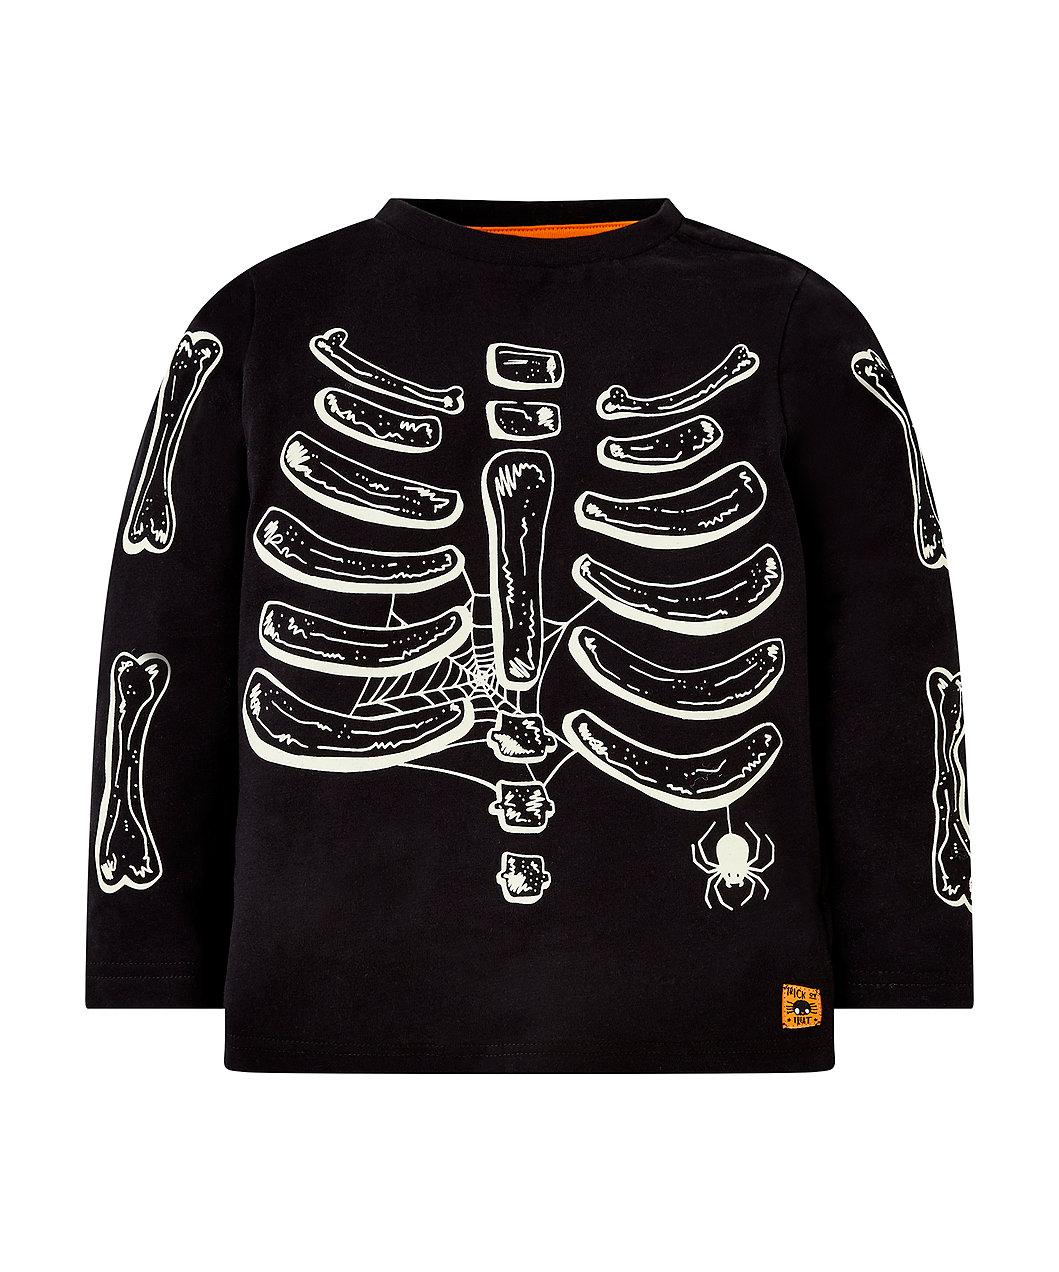 c2373d5f halloween glow-in-the-dark skeleton t-shirt